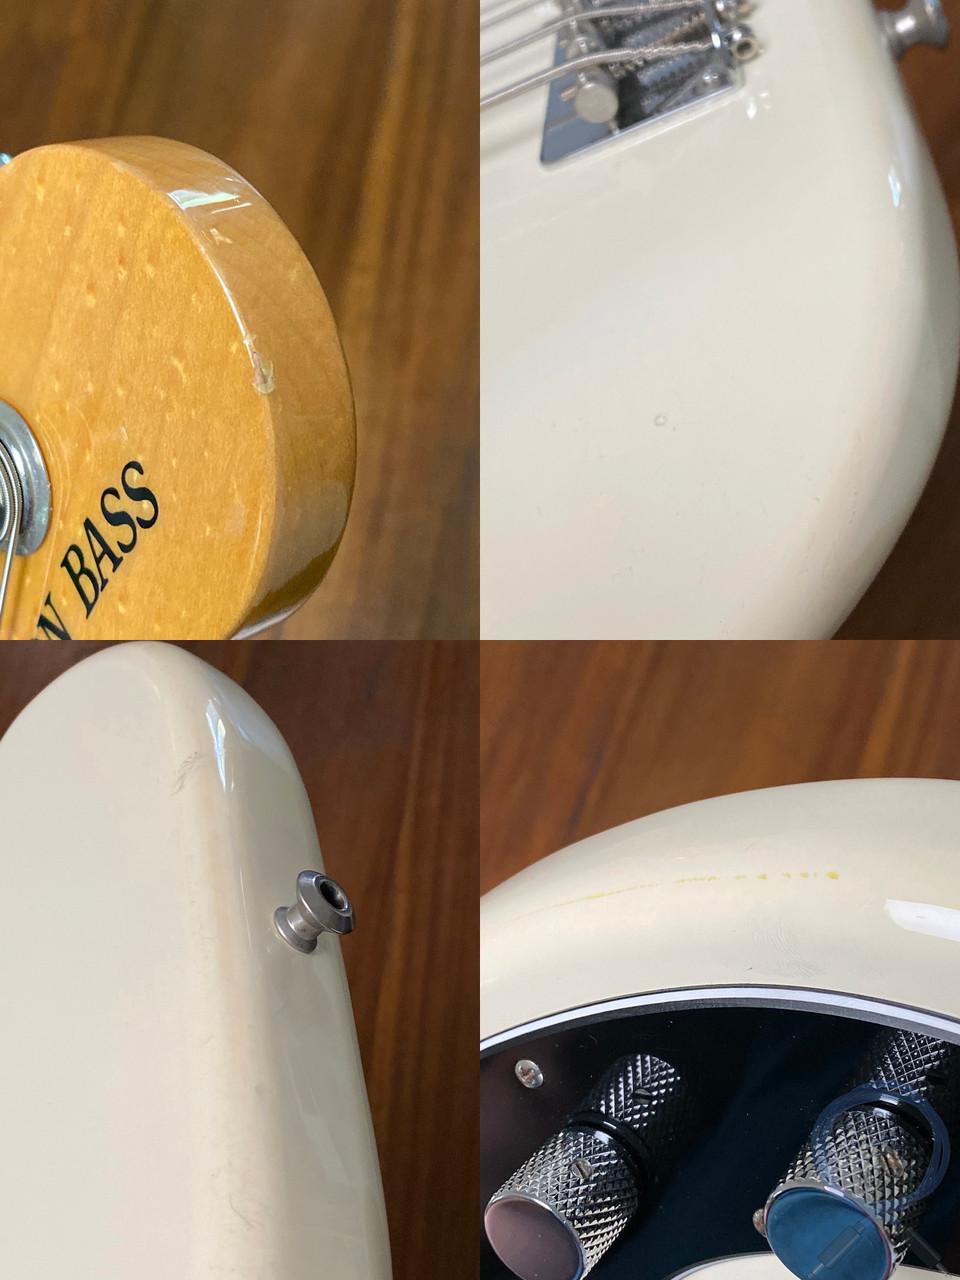 Fender Precision Bass, '70, Olympic White, 2008, USA PUP, Bird Eye Maple